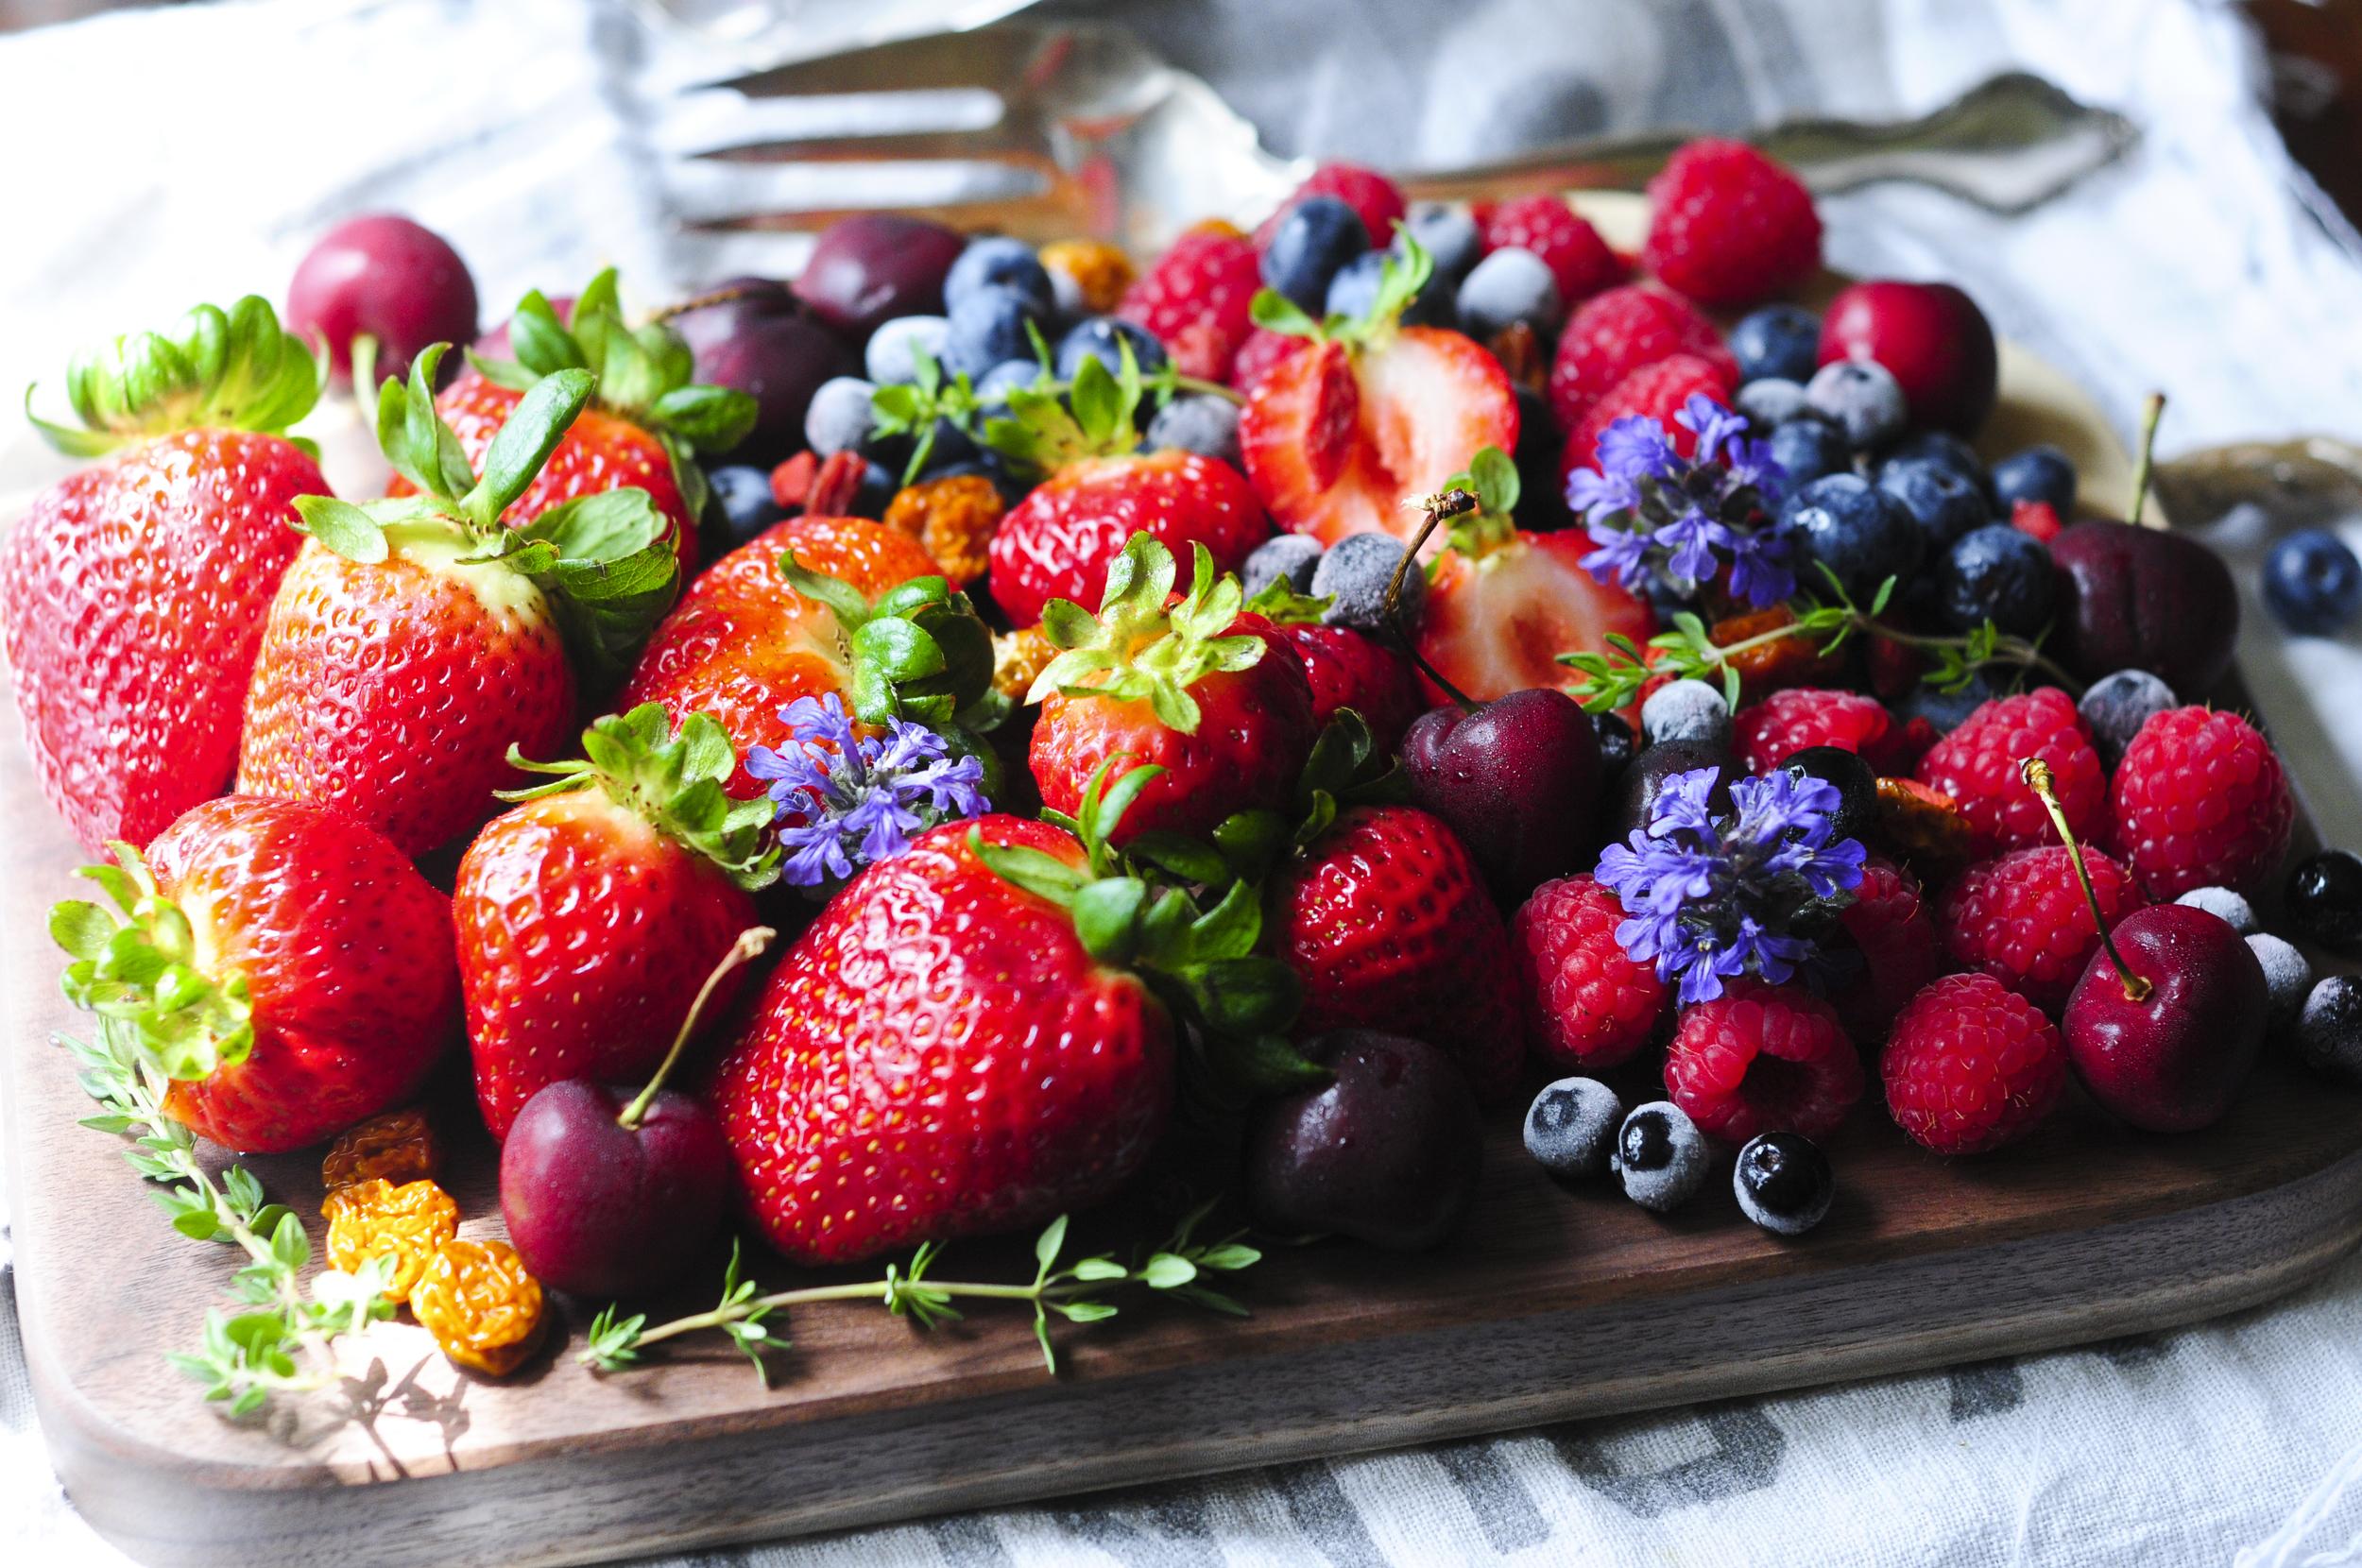 a.big.cutting.board.strawberry.blueberry.raspberry.golden.goji.cherry.fruit.plate.DSC_8761.jpg